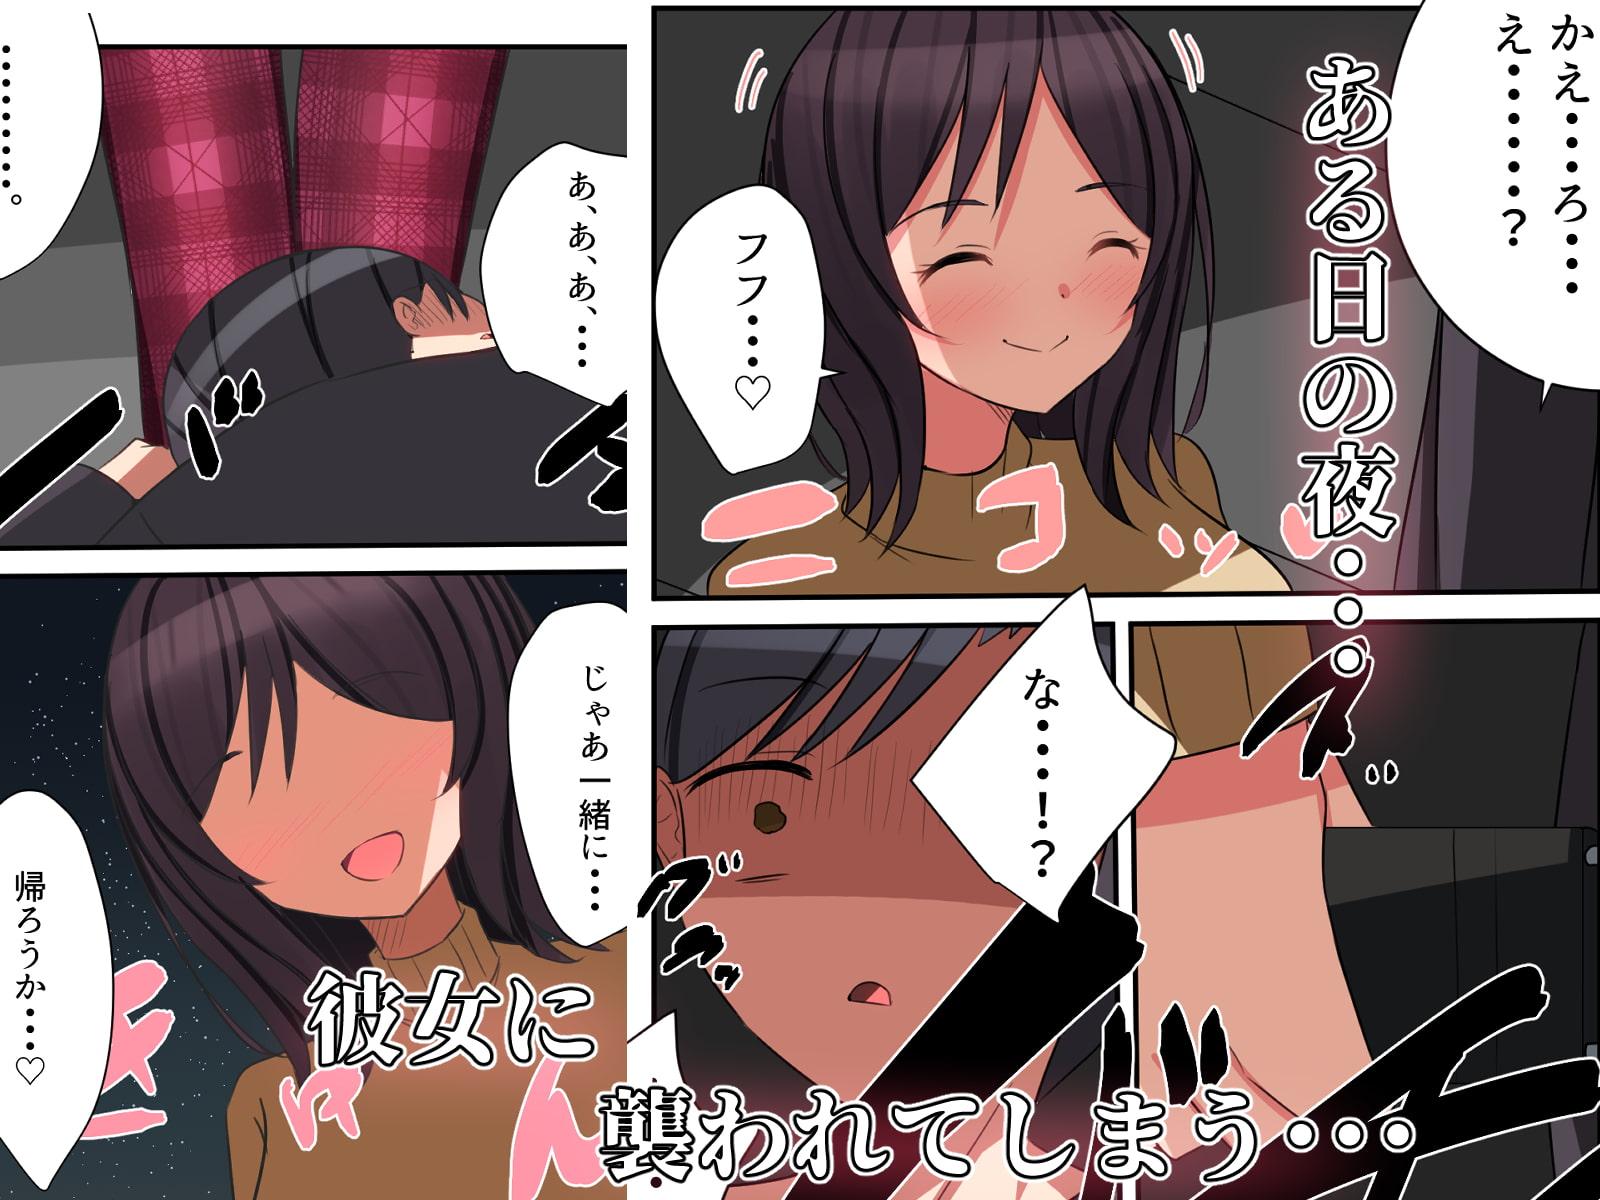 RJ316439 監禁少女~監禁が趣味な女の子に襲われ無理やり全てを絞り取られる話~ [20210212]